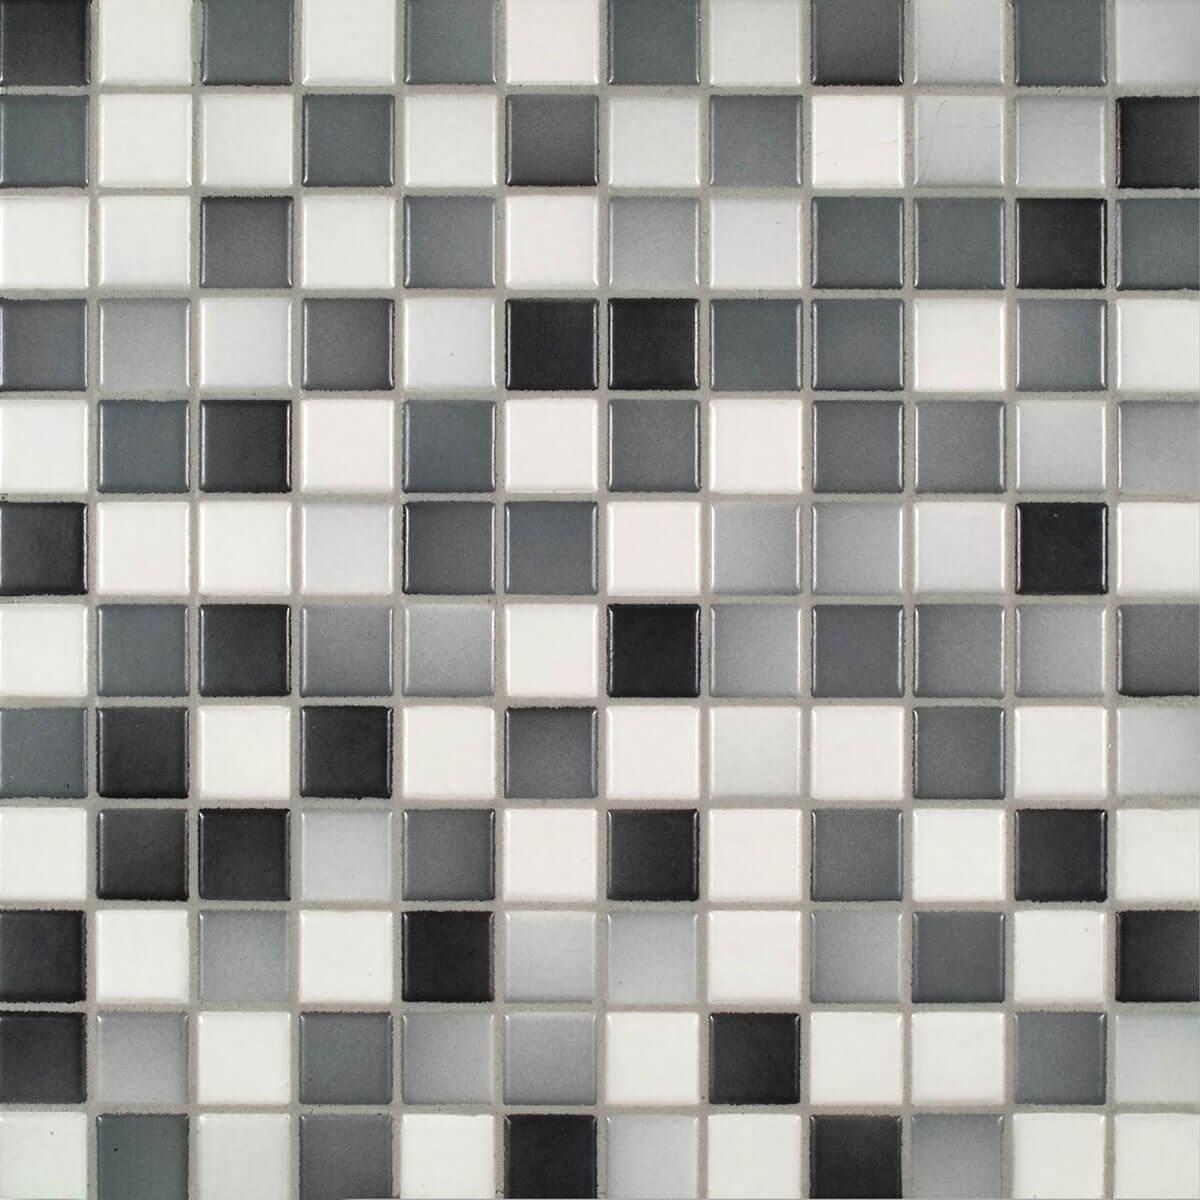 Agrob Buchtal Tiles - KLAY_Plural-_0004_GREY25-–-5550I-7160H-SPHERE-NEUTRAL